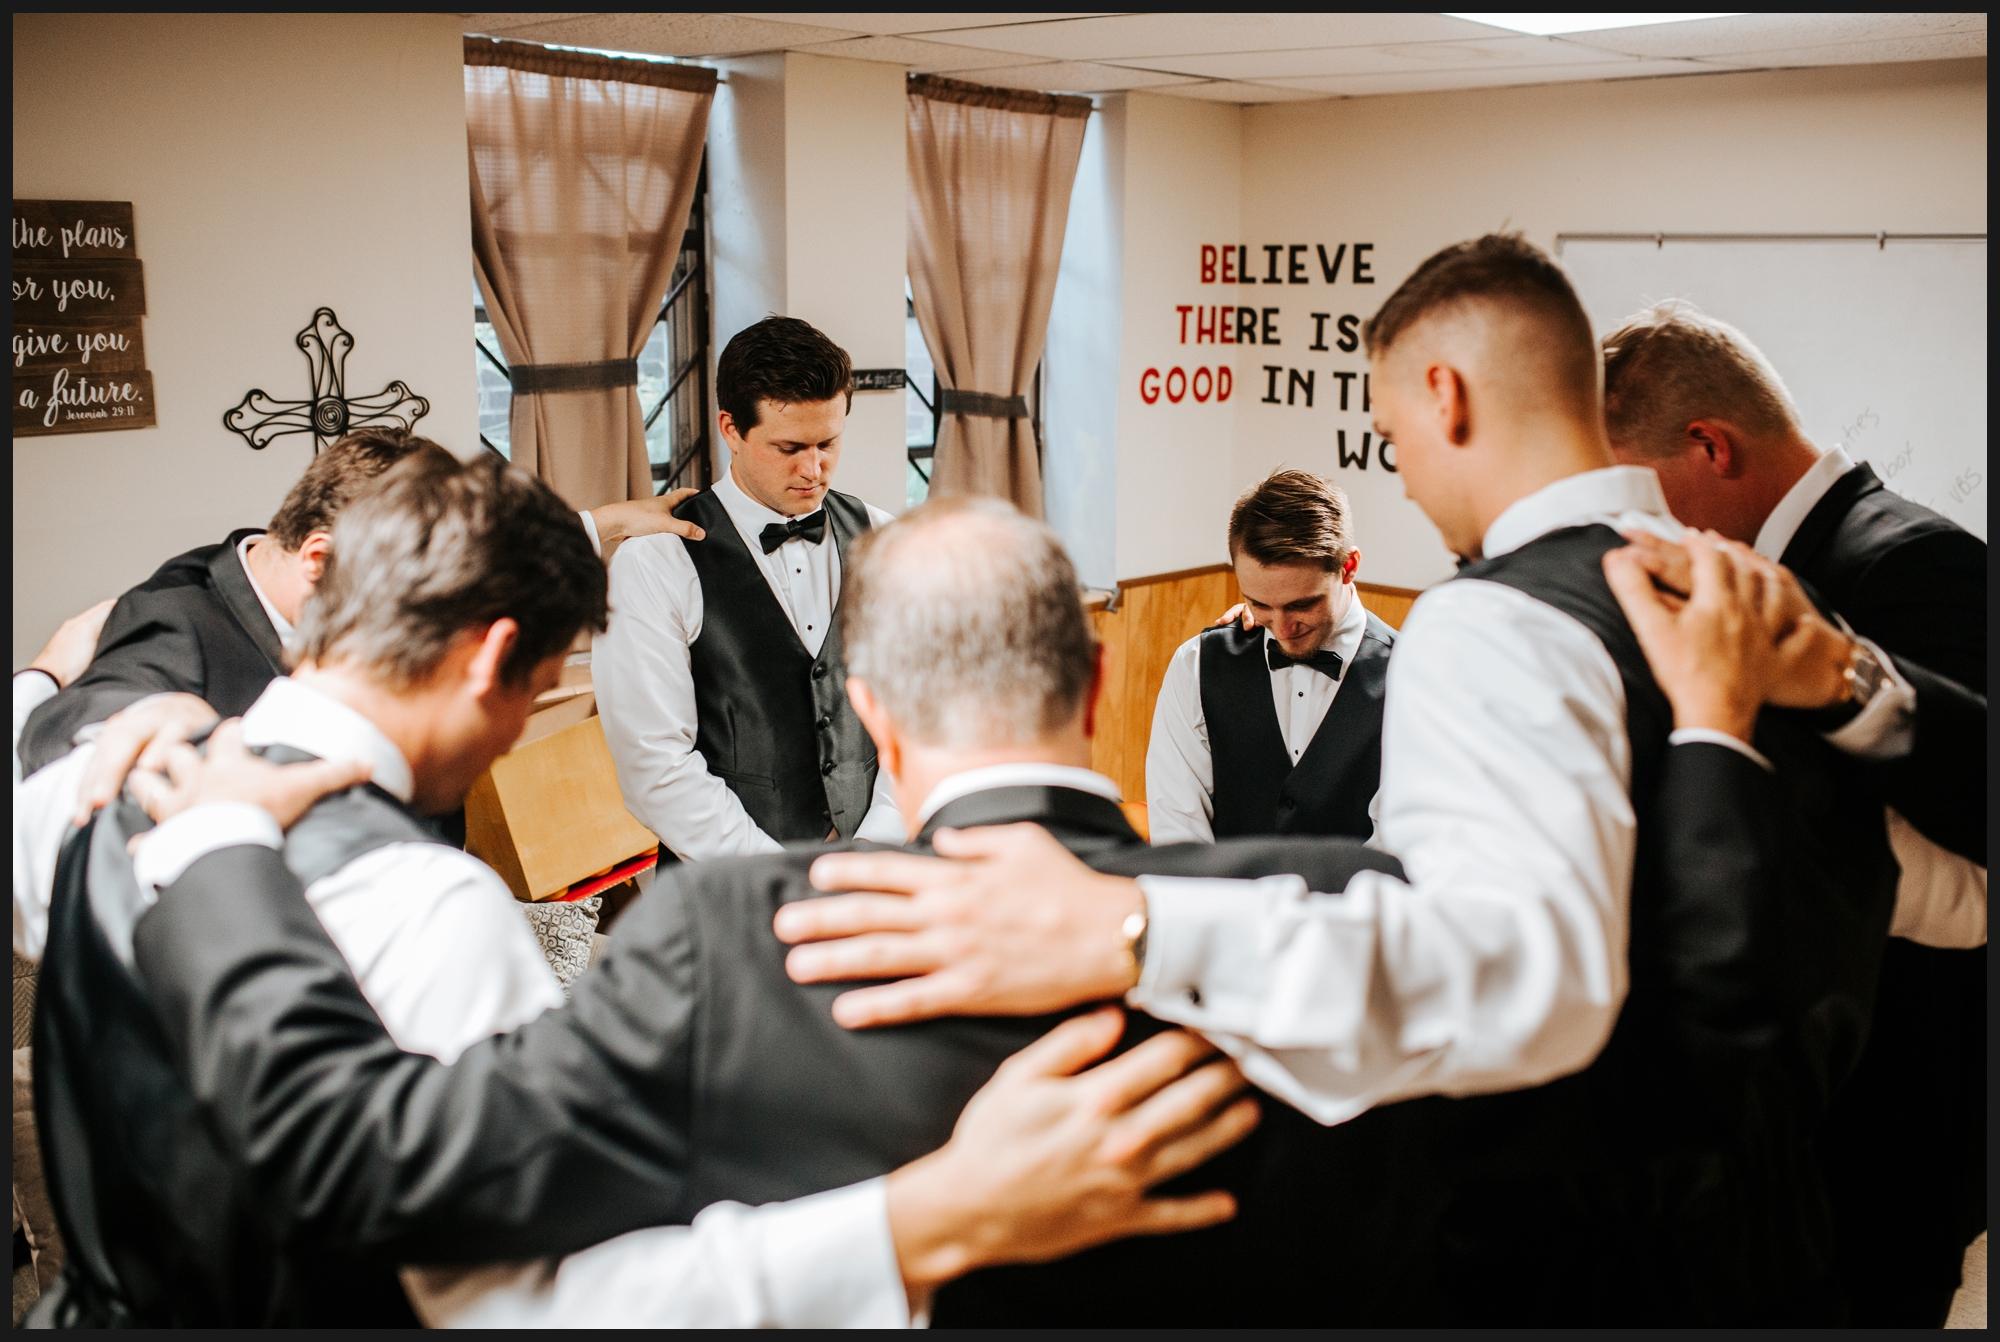 Orlando-Wedding-Photographer-destination-wedding-photographer-florida-wedding-photographer-bohemian-wedding-photographer_0050.jpg